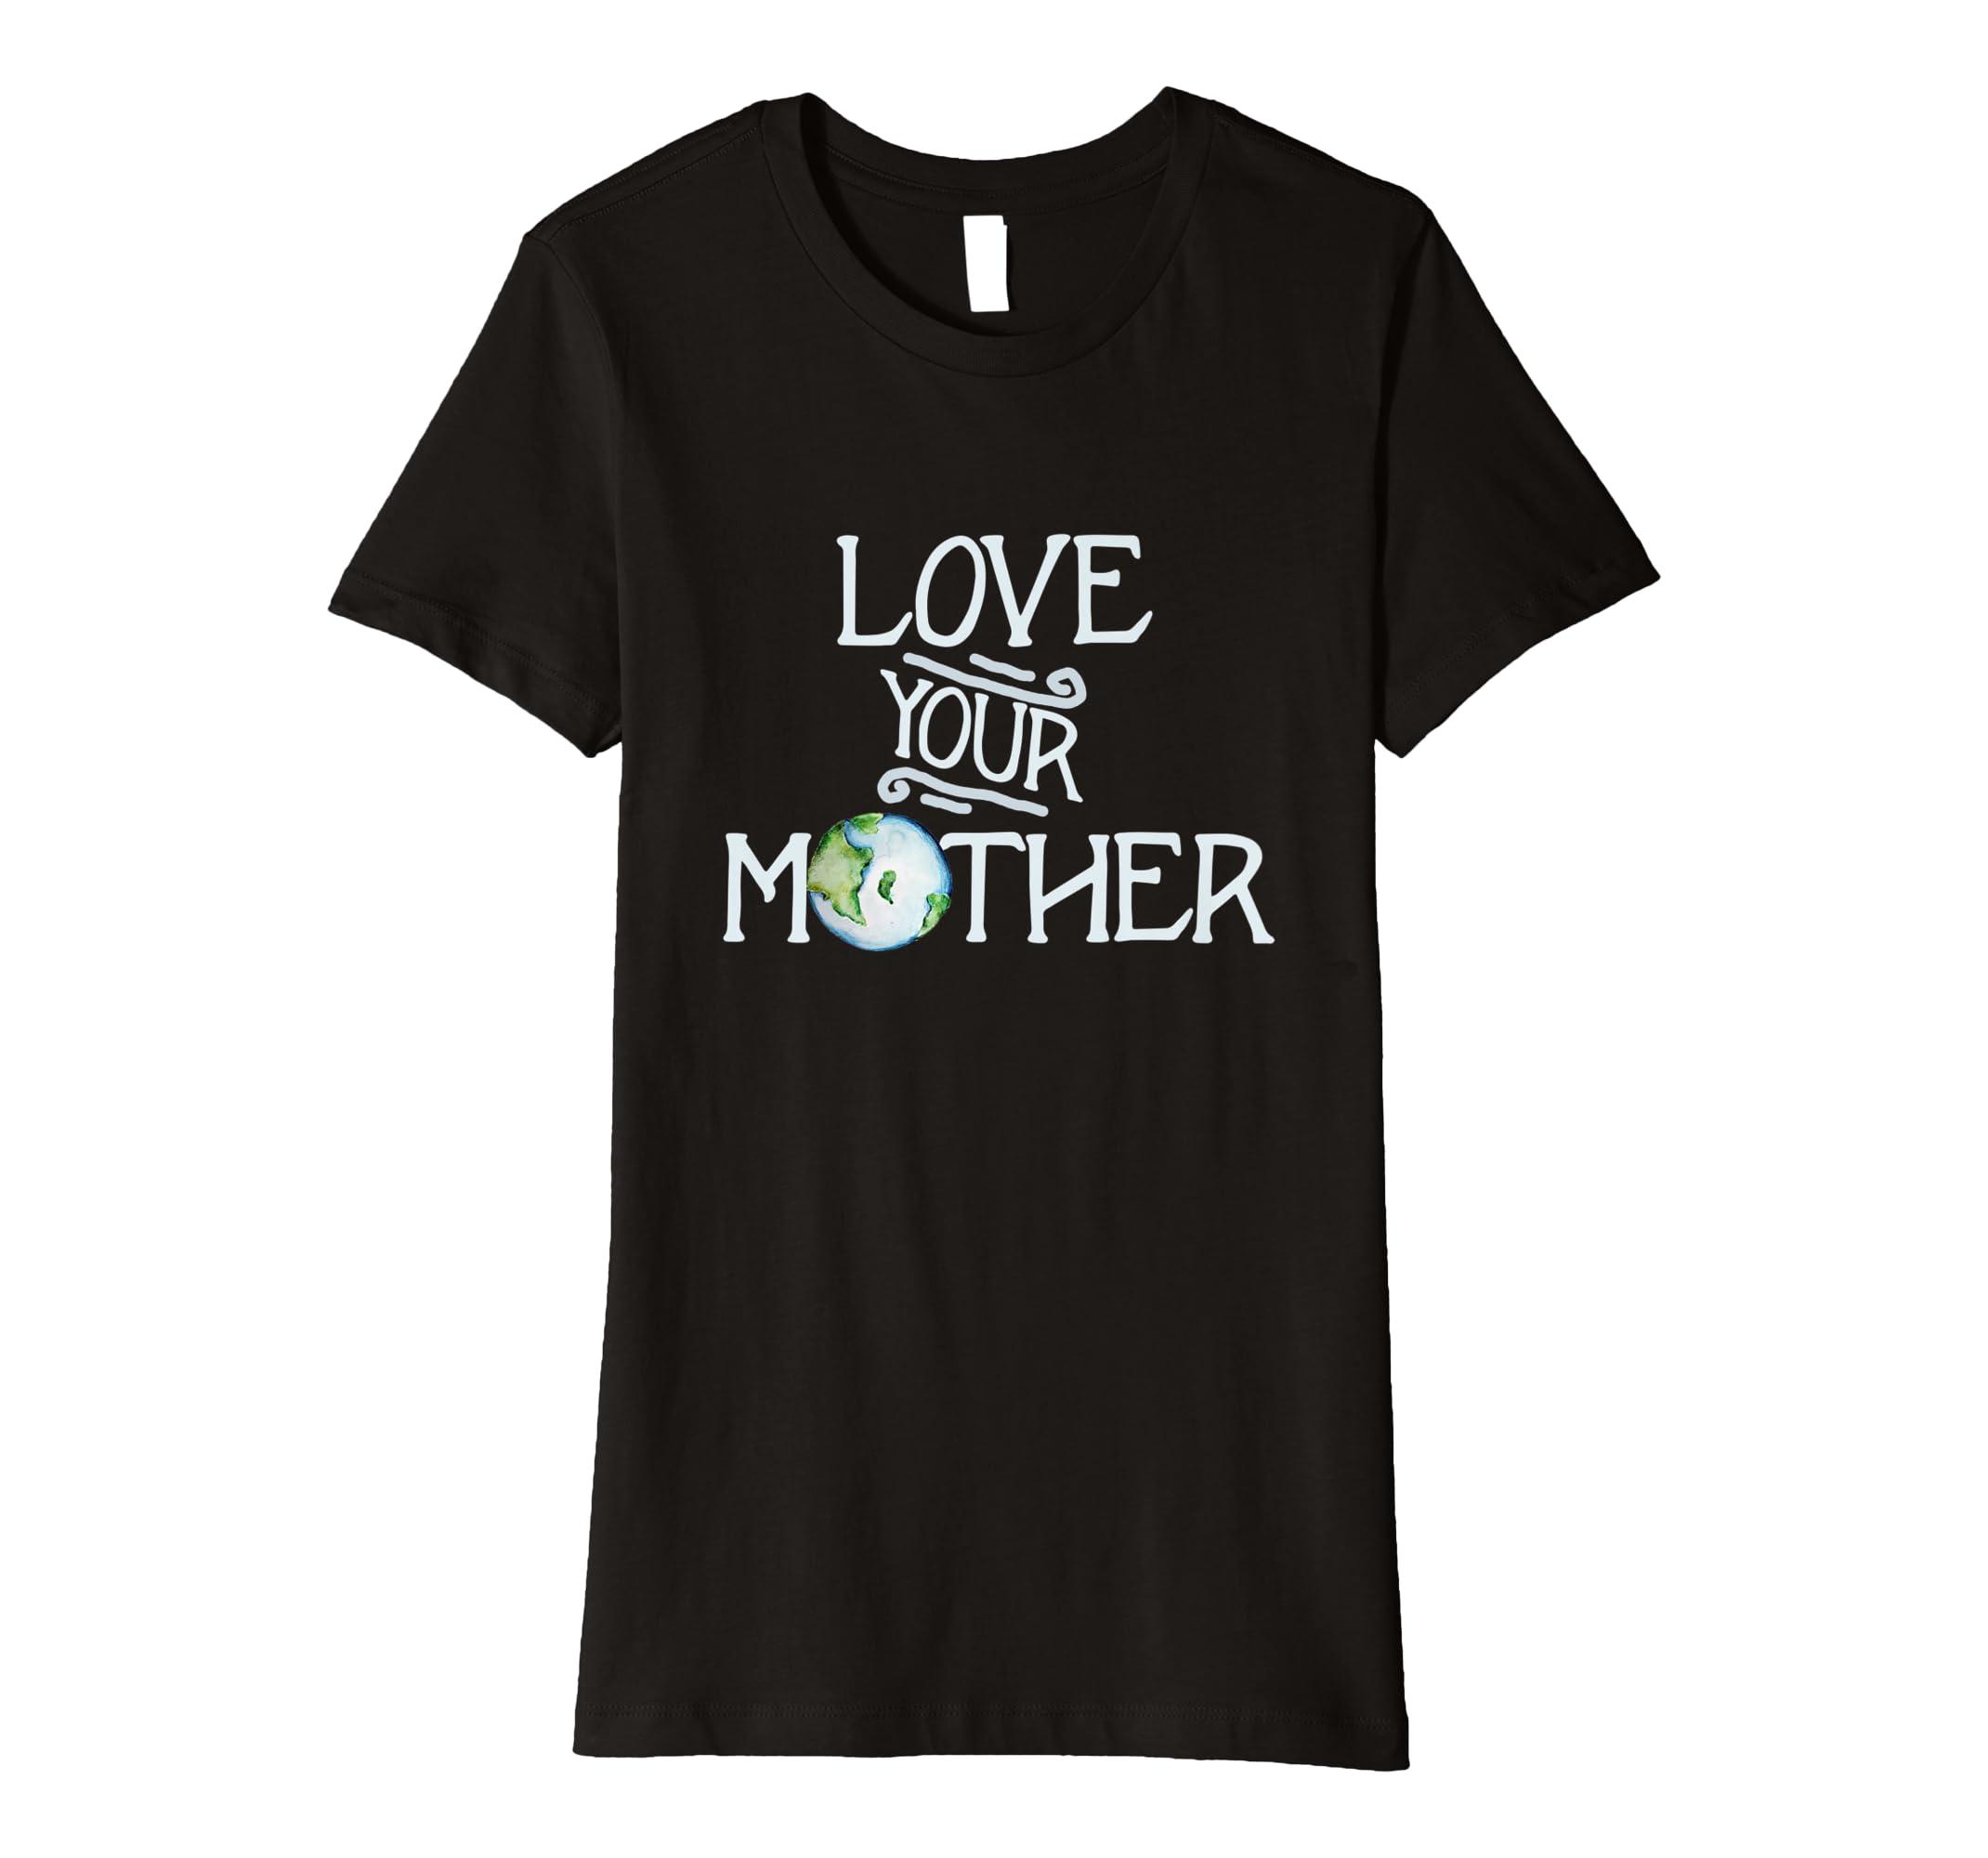 f6b2c81cd Amazon.com: Love your mother earth tee shirts earth day art tee shirts:  Clothing